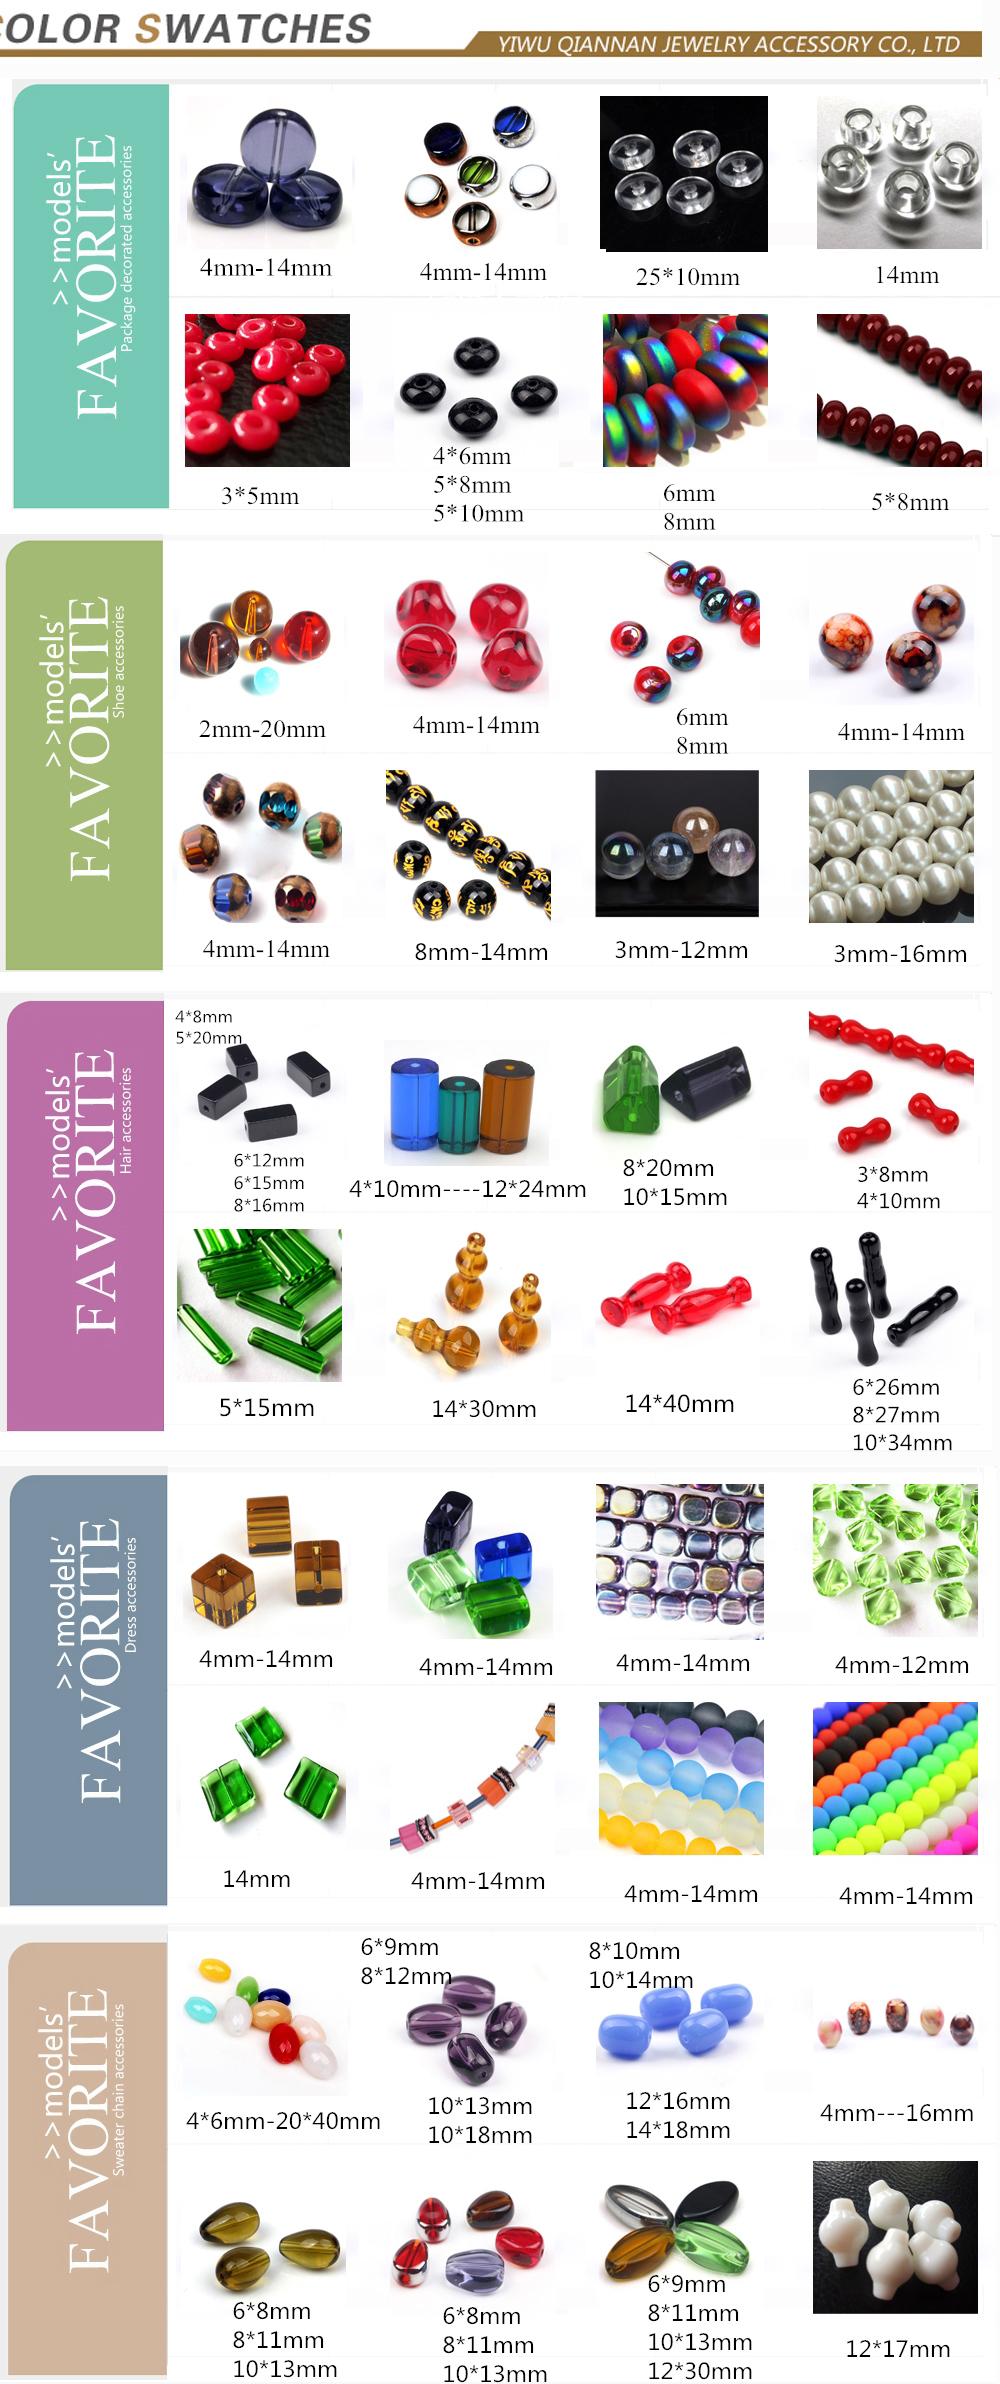 2019 Yiwu popular jewelry accessory wholesale handmade Japanese murano pressed round crystal beads 4-14 mm gray